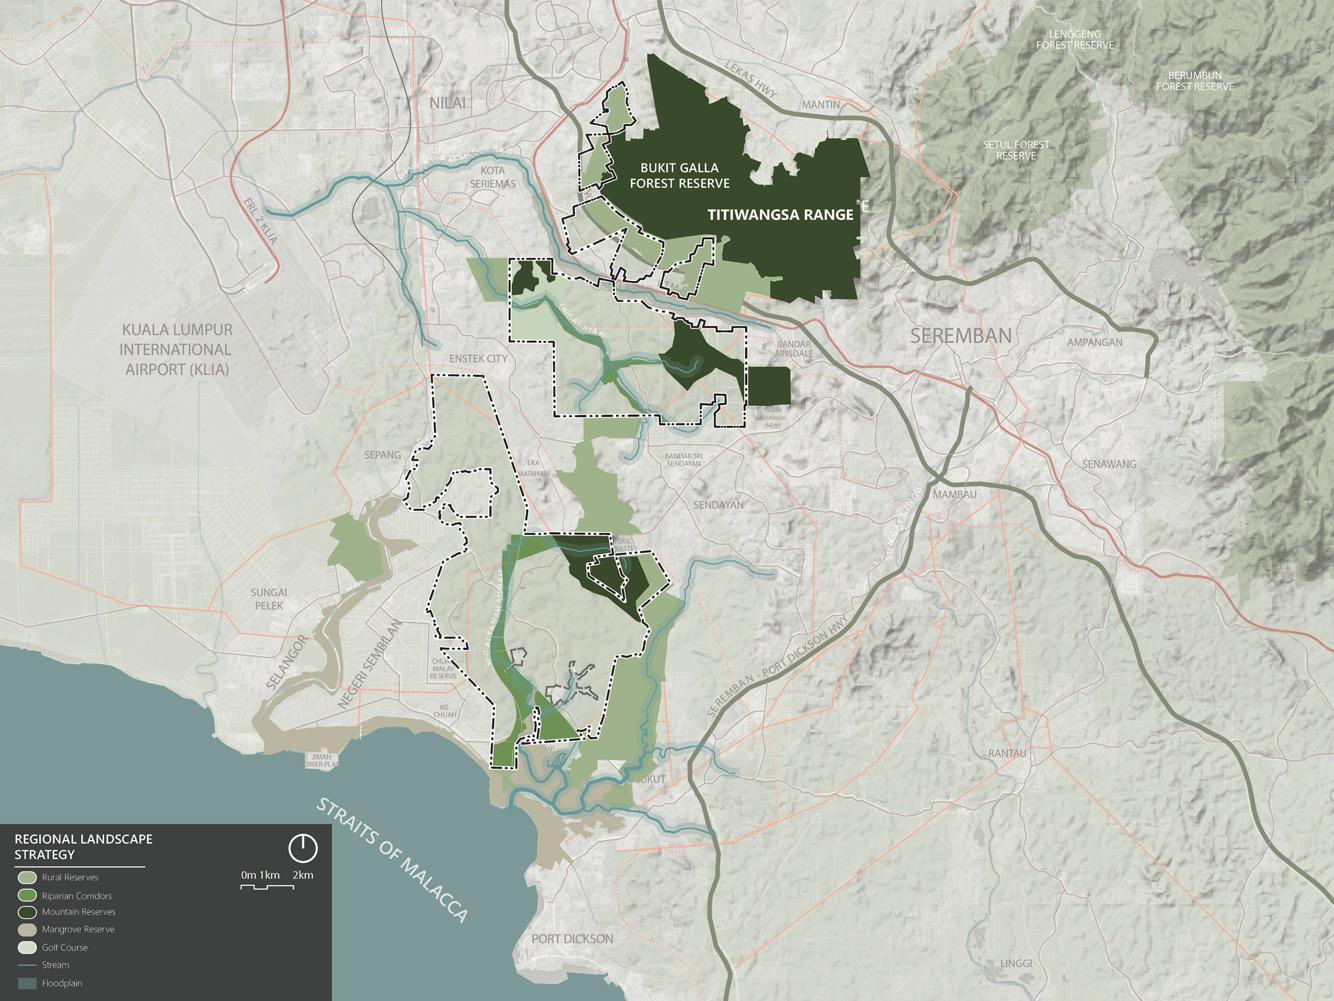 Malaysia-Vision-Valley_Regional-Landscape-Masterplan_Klopfer-Martin.jpg